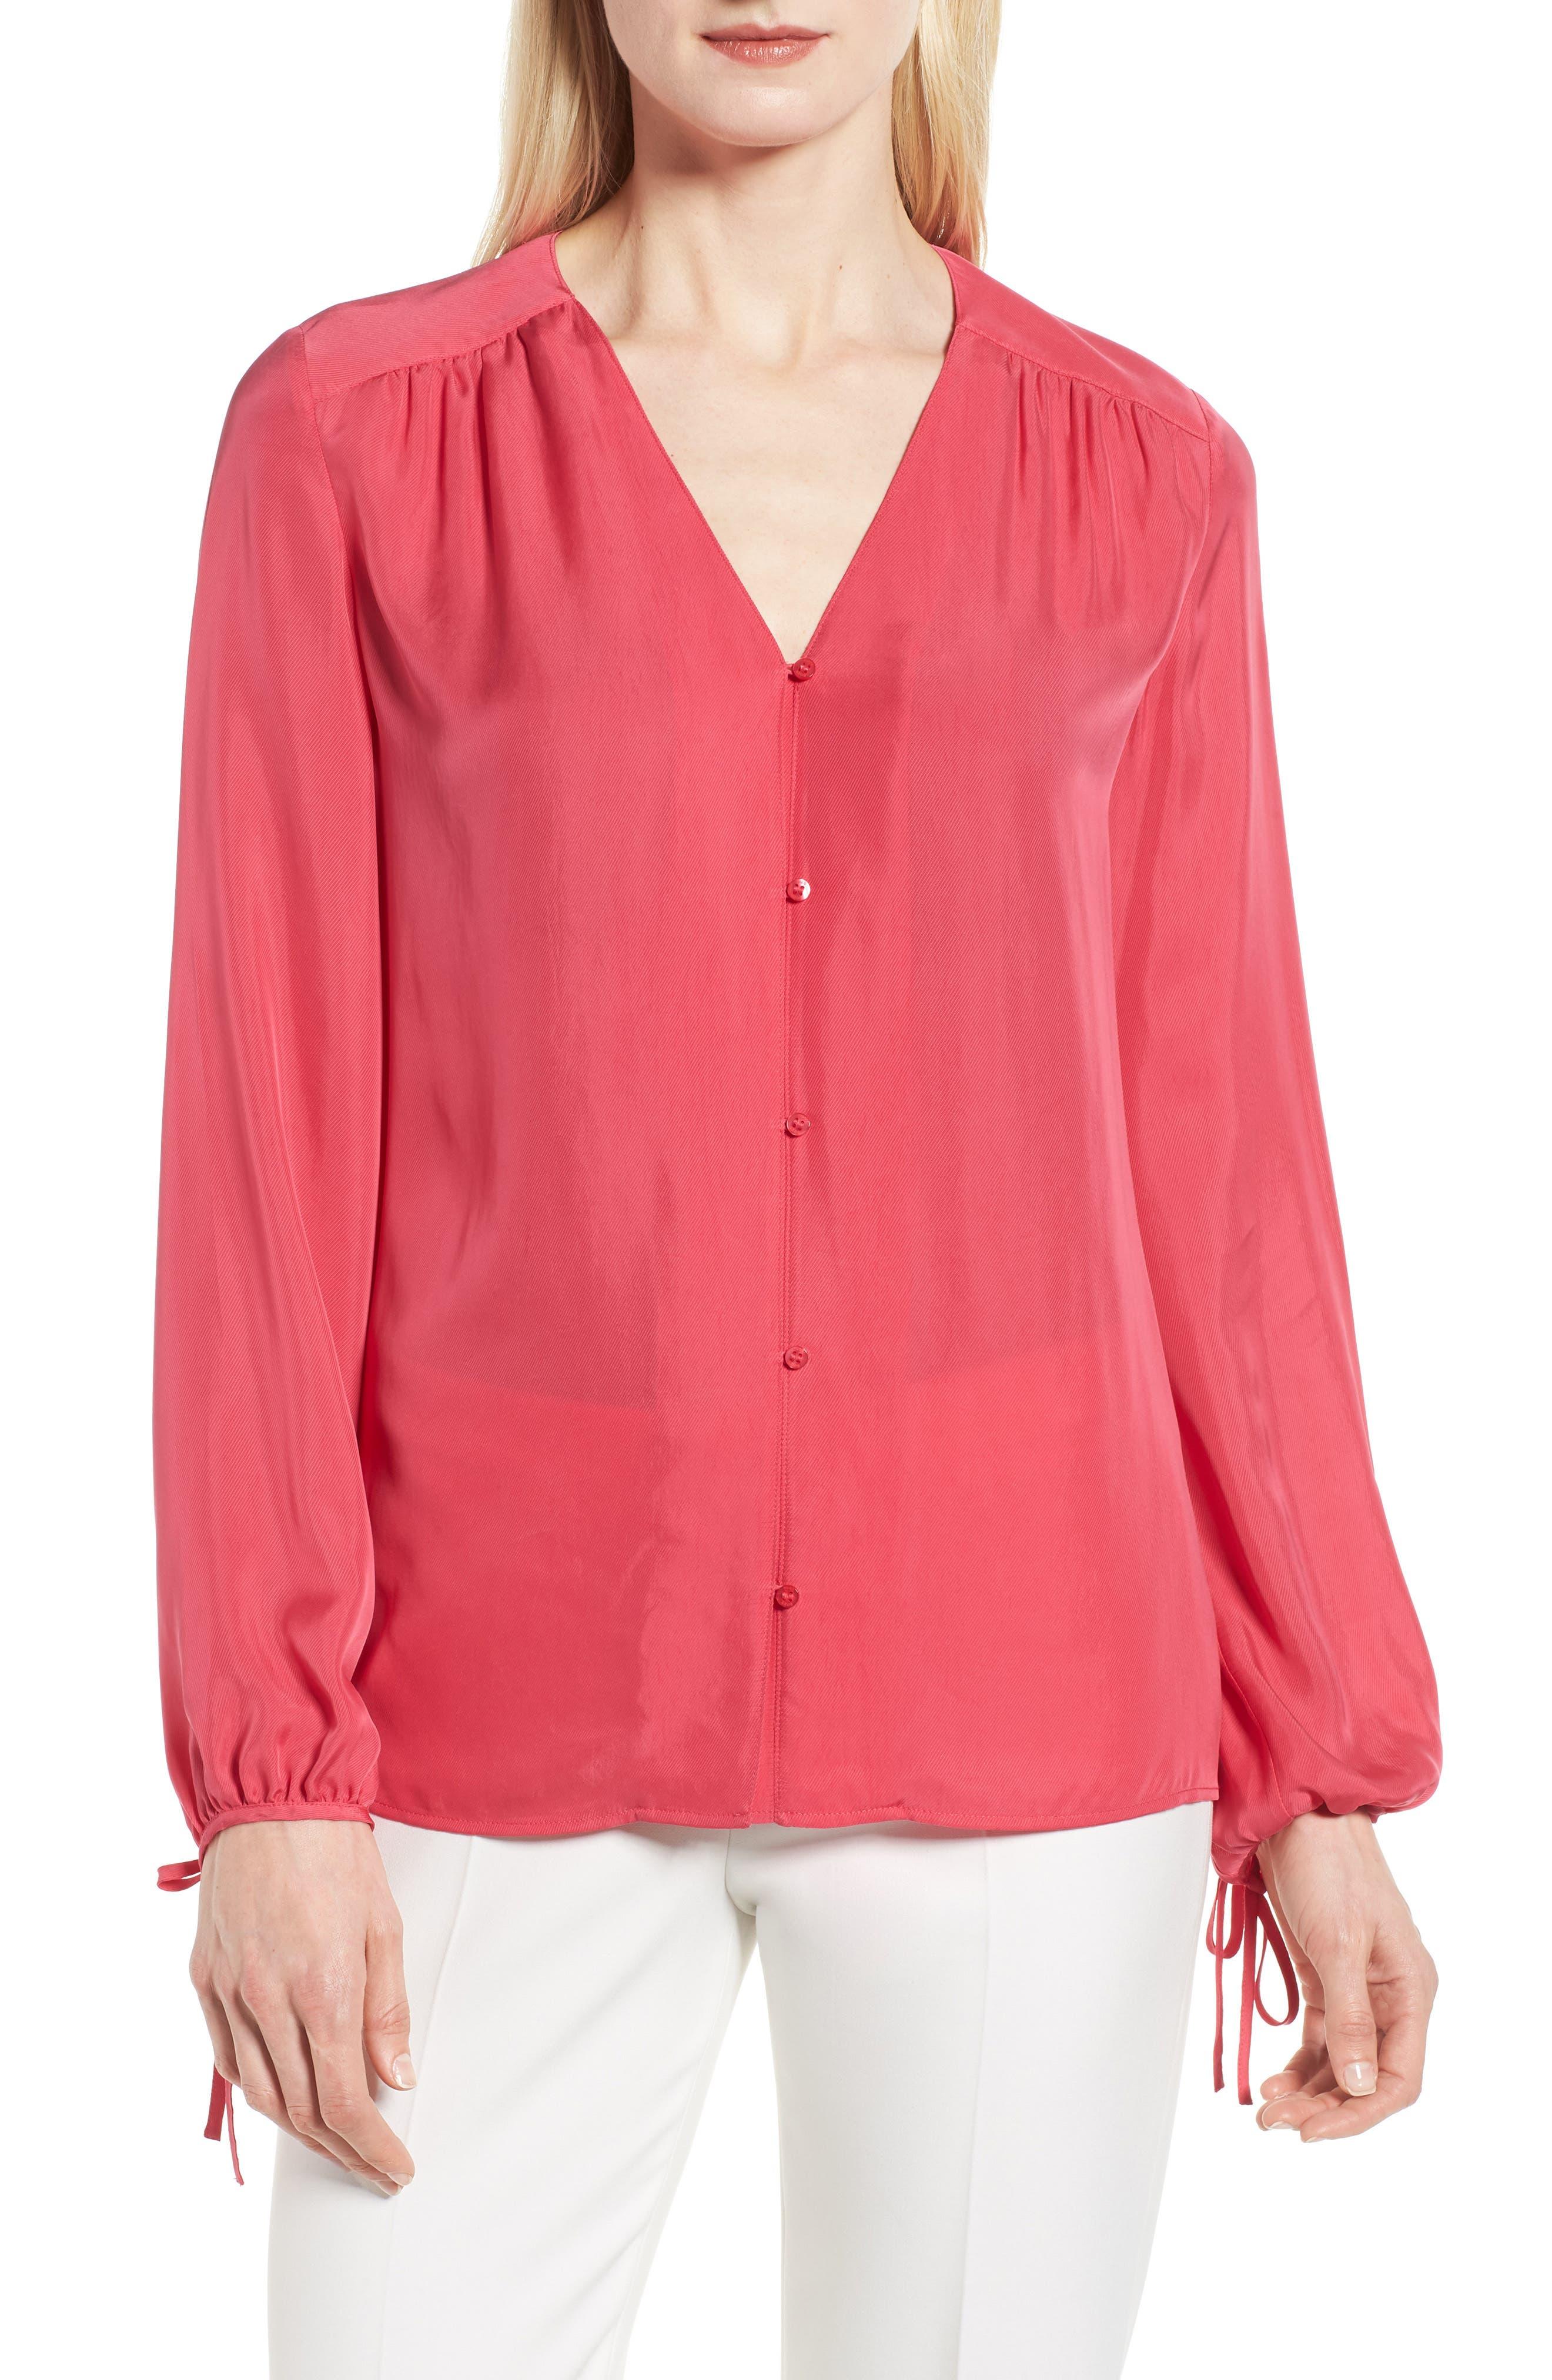 Rosalia Blouse,                         Main,                         color, Lychee Pink